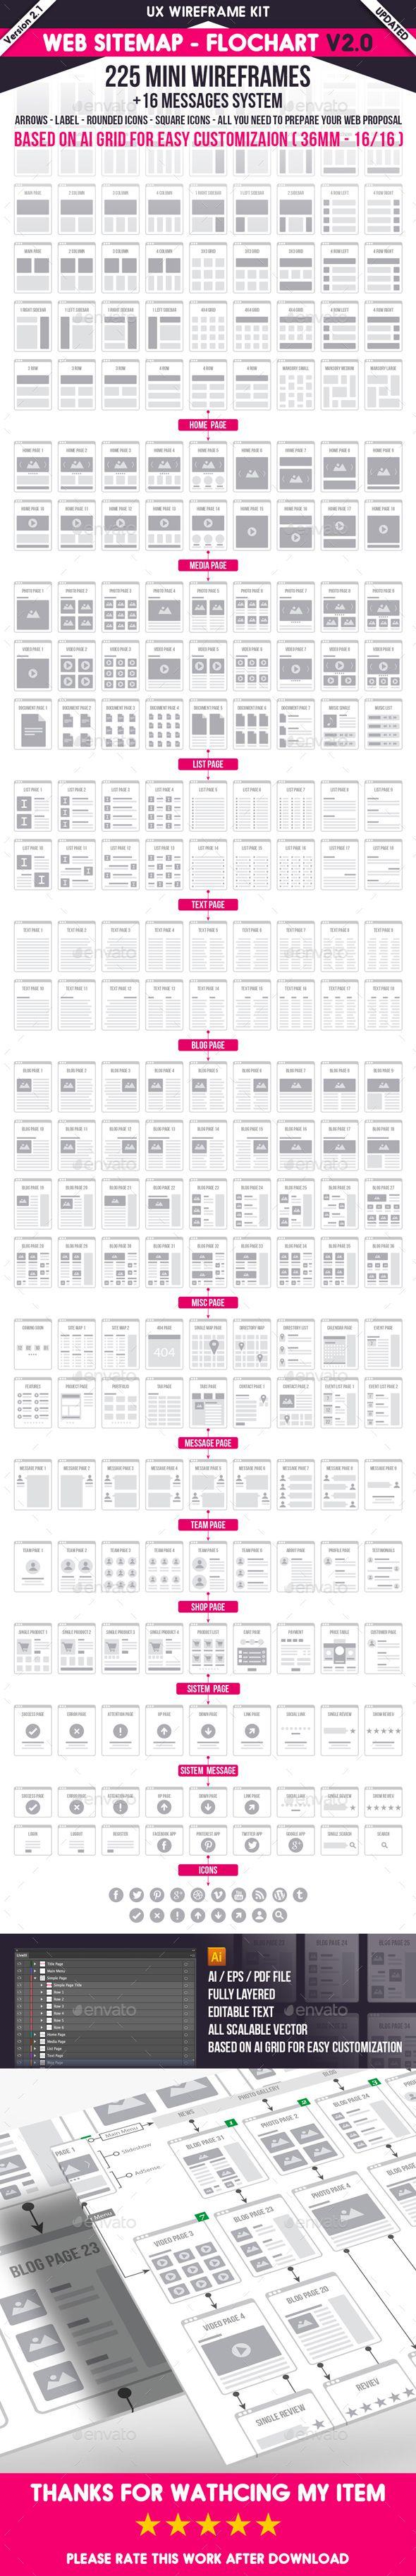 Web Sitemap - Flowcharts v2.0 (User Interfaces)